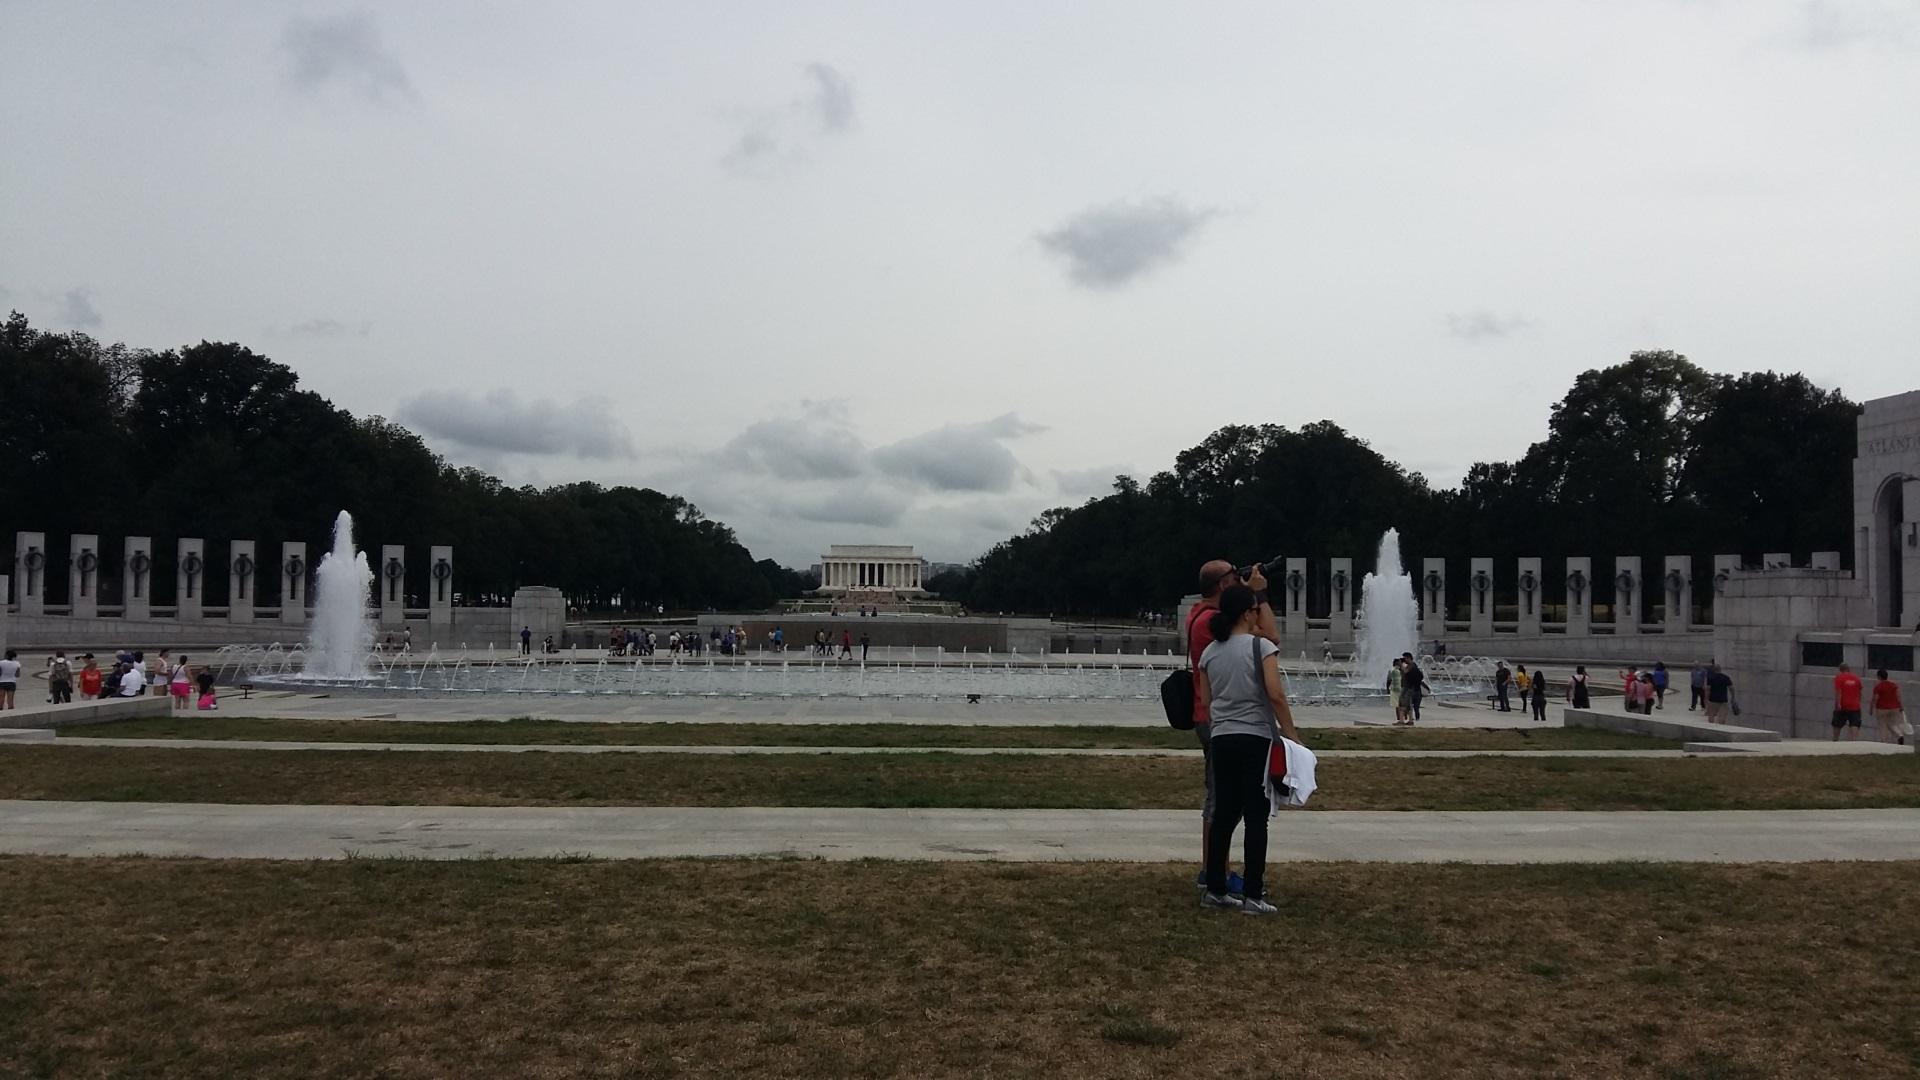 washington national mall zone